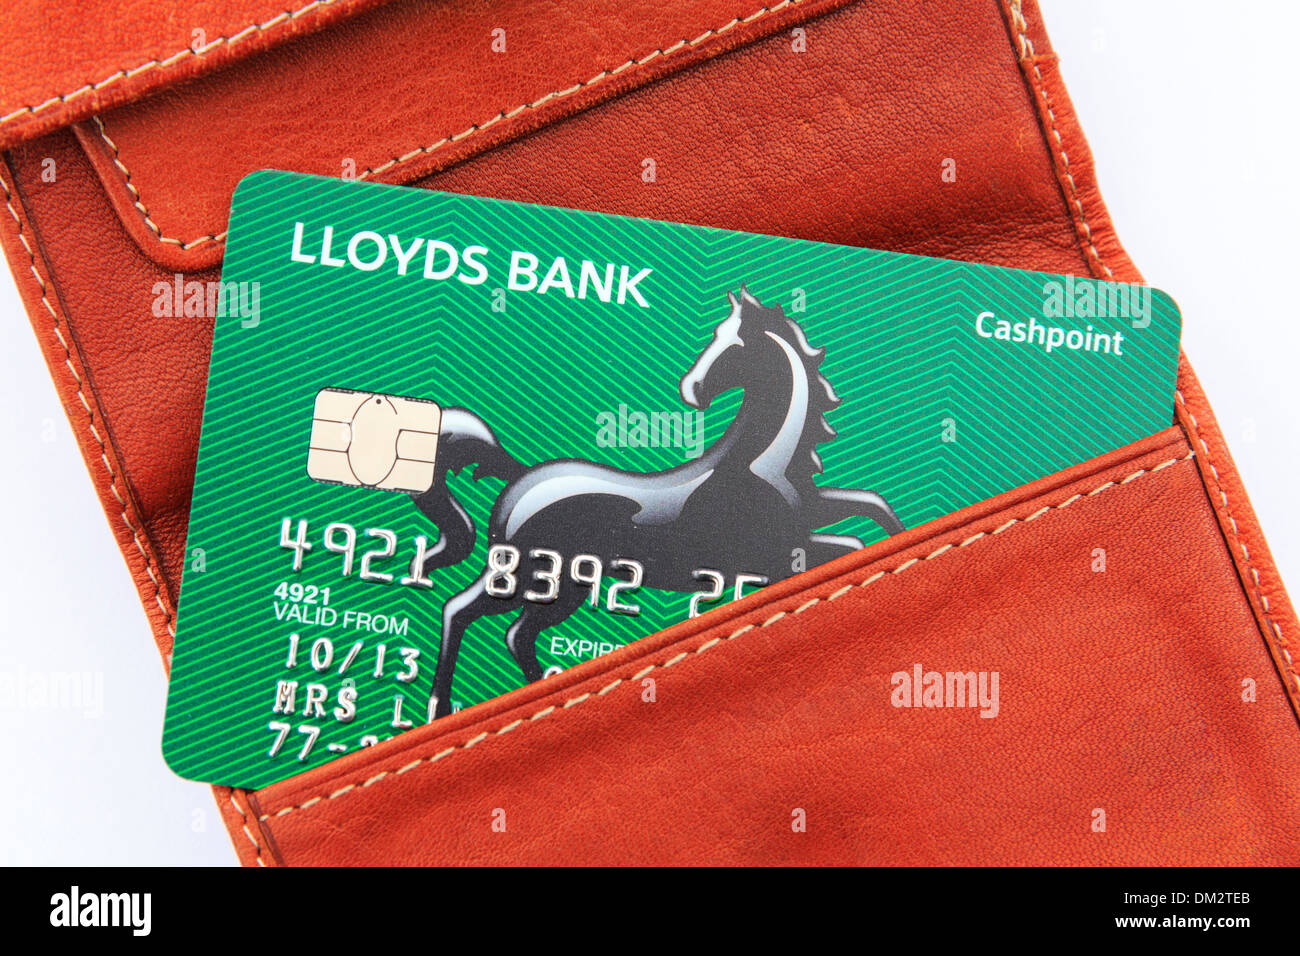 Bankcard Stock Photos & Bankcard Stock Images - Alamy